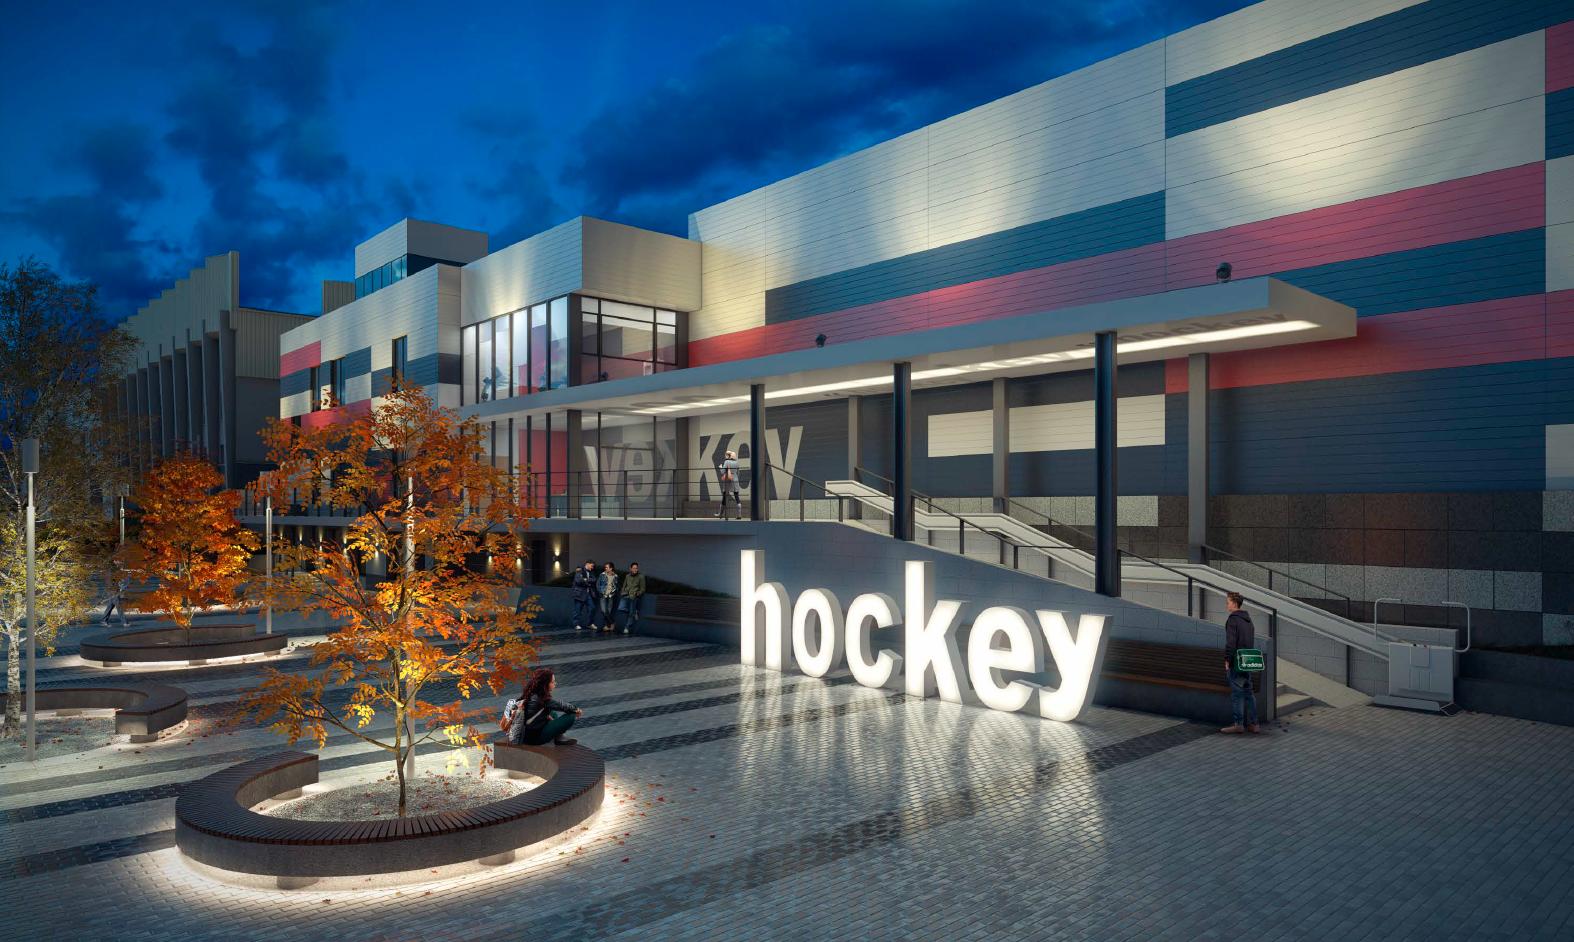 Хоккейный дворец от Путина на территории «Юности» подорожал на 50 млн рублей